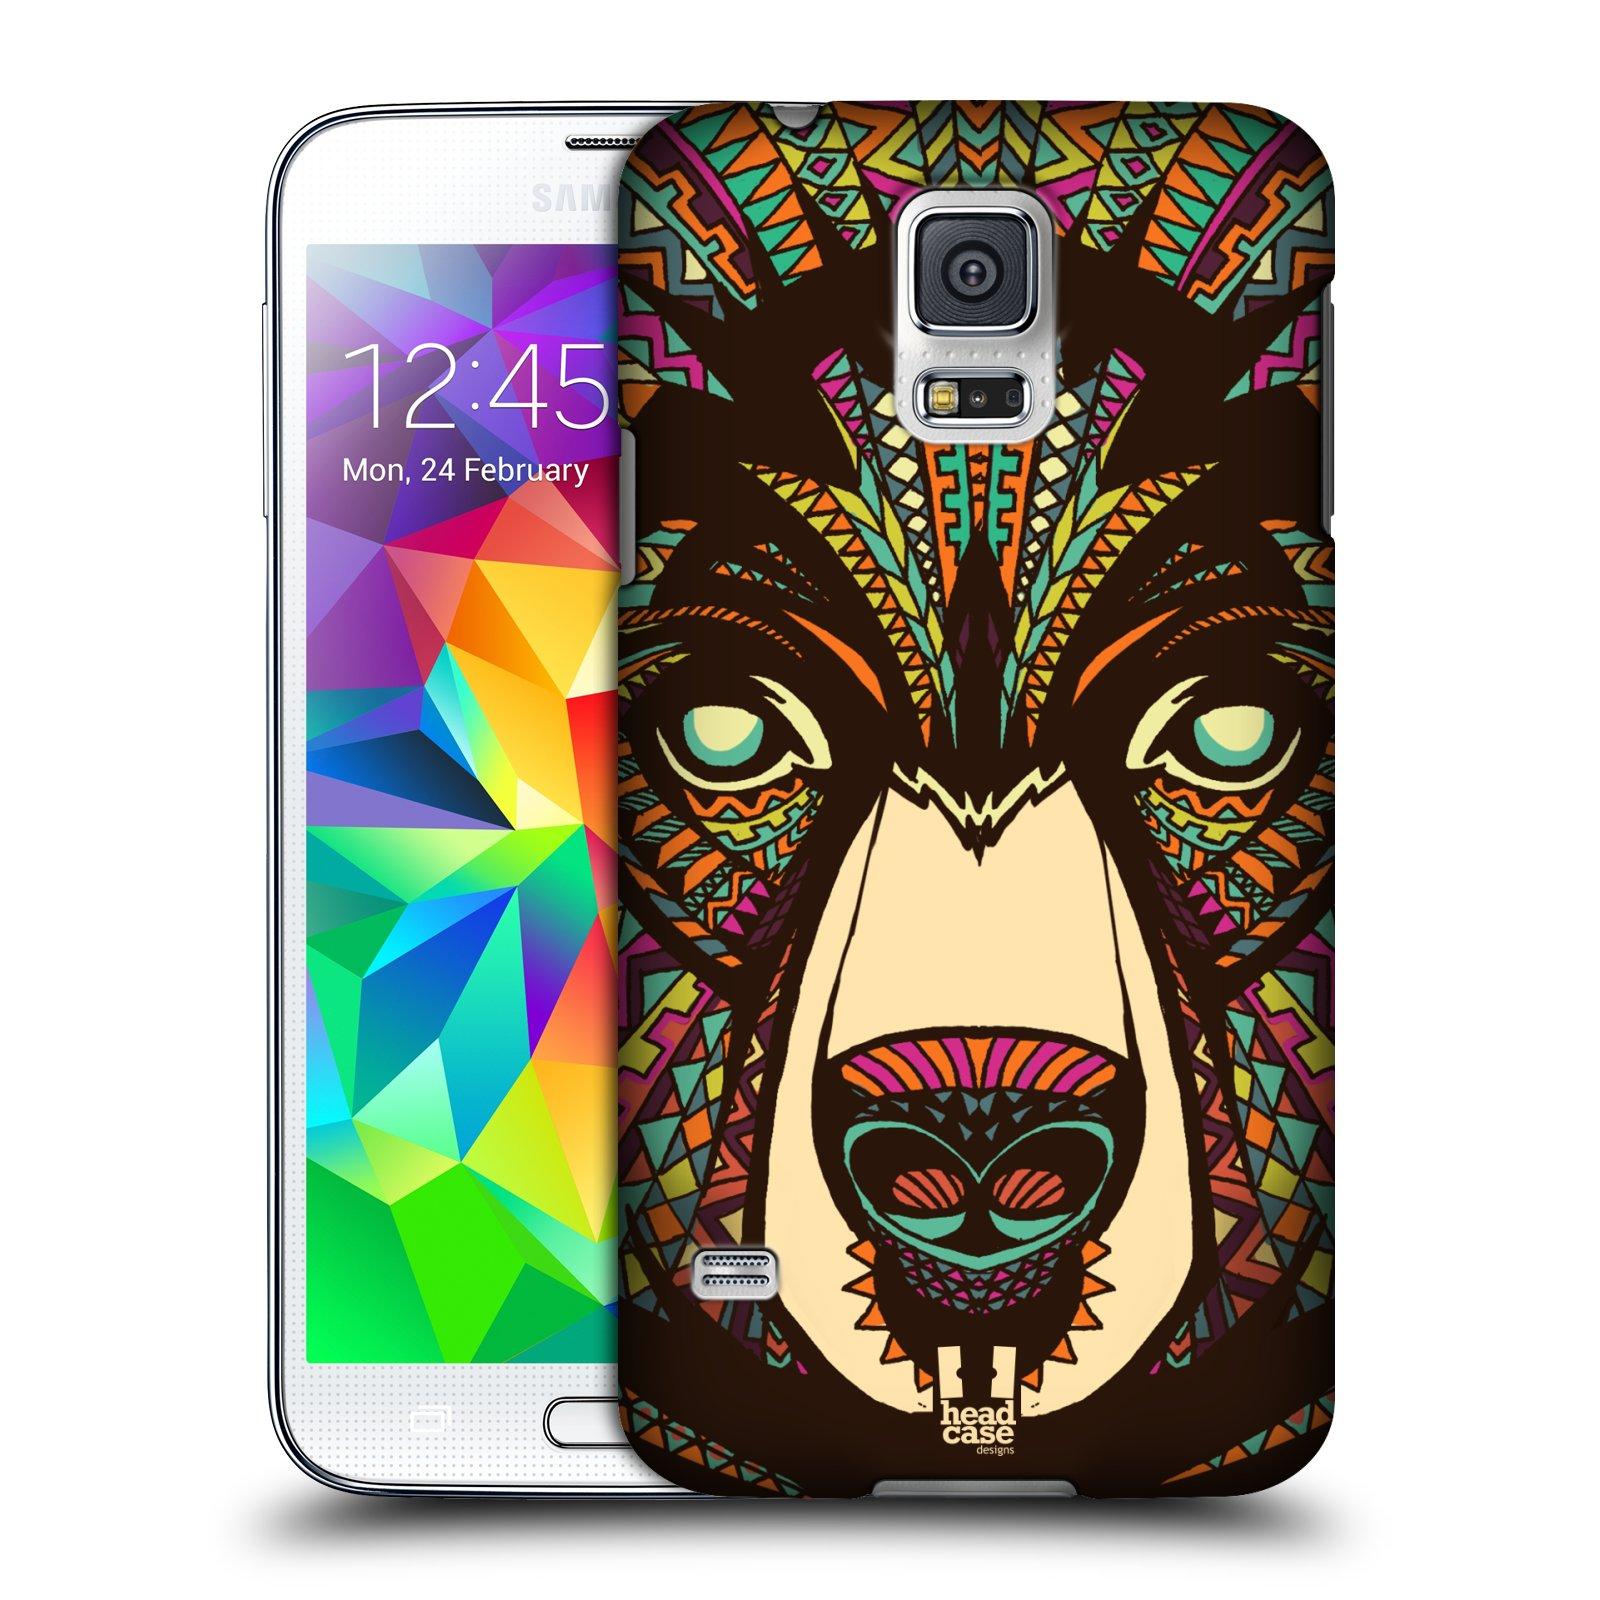 Plastové pouzdro na mobil Samsung Galaxy S5 HEAD CASE AZTEC MEDVĚD